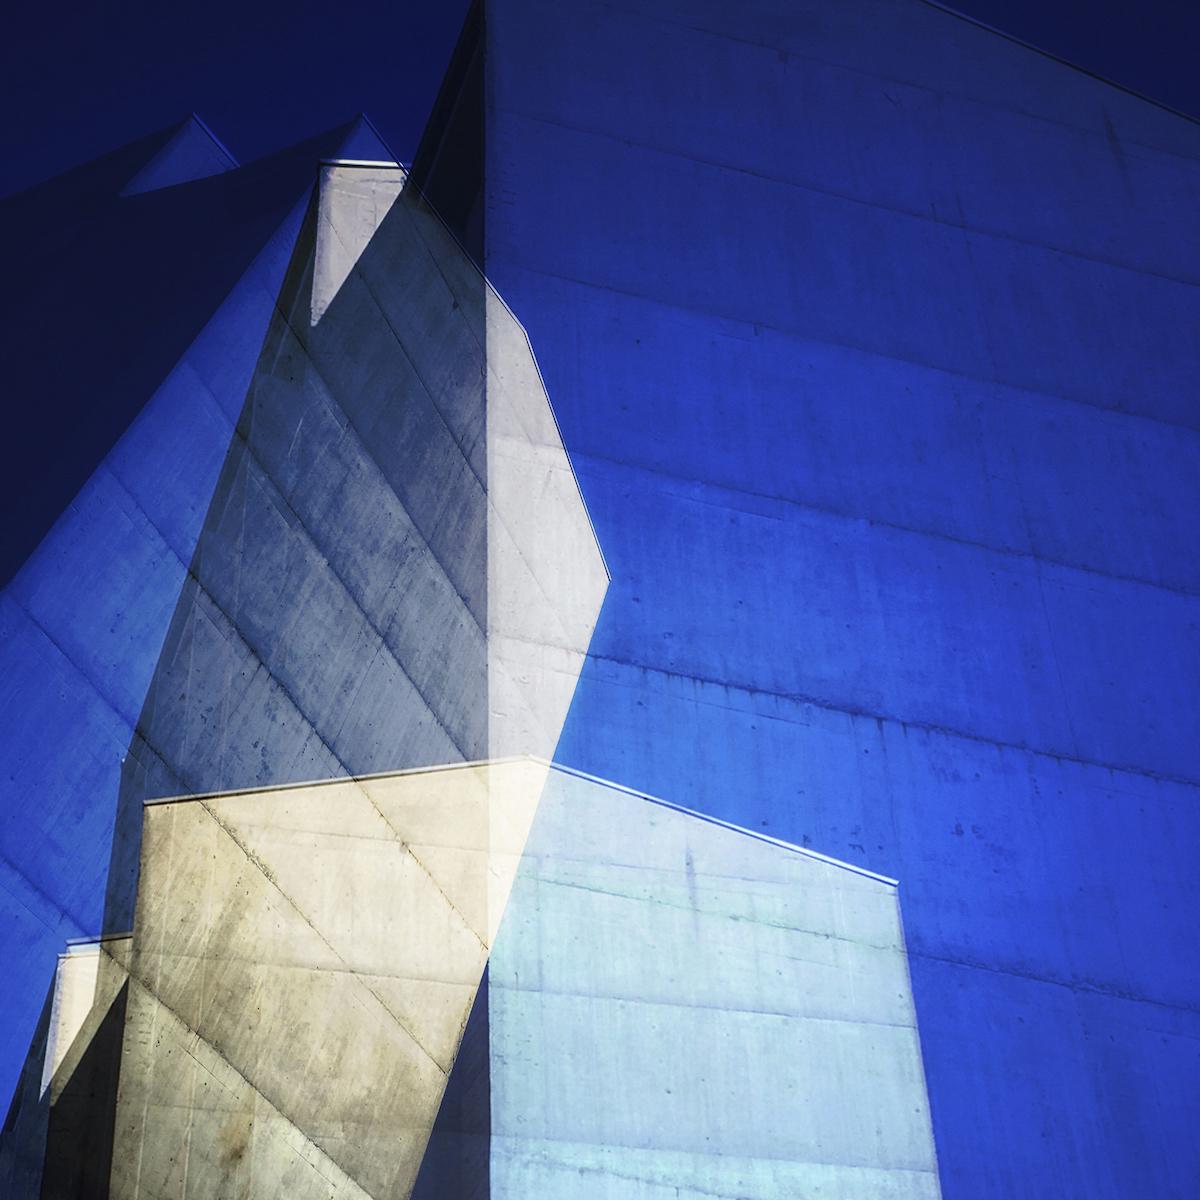 ©Anna Rosati, Cattedrali urbane, 2020